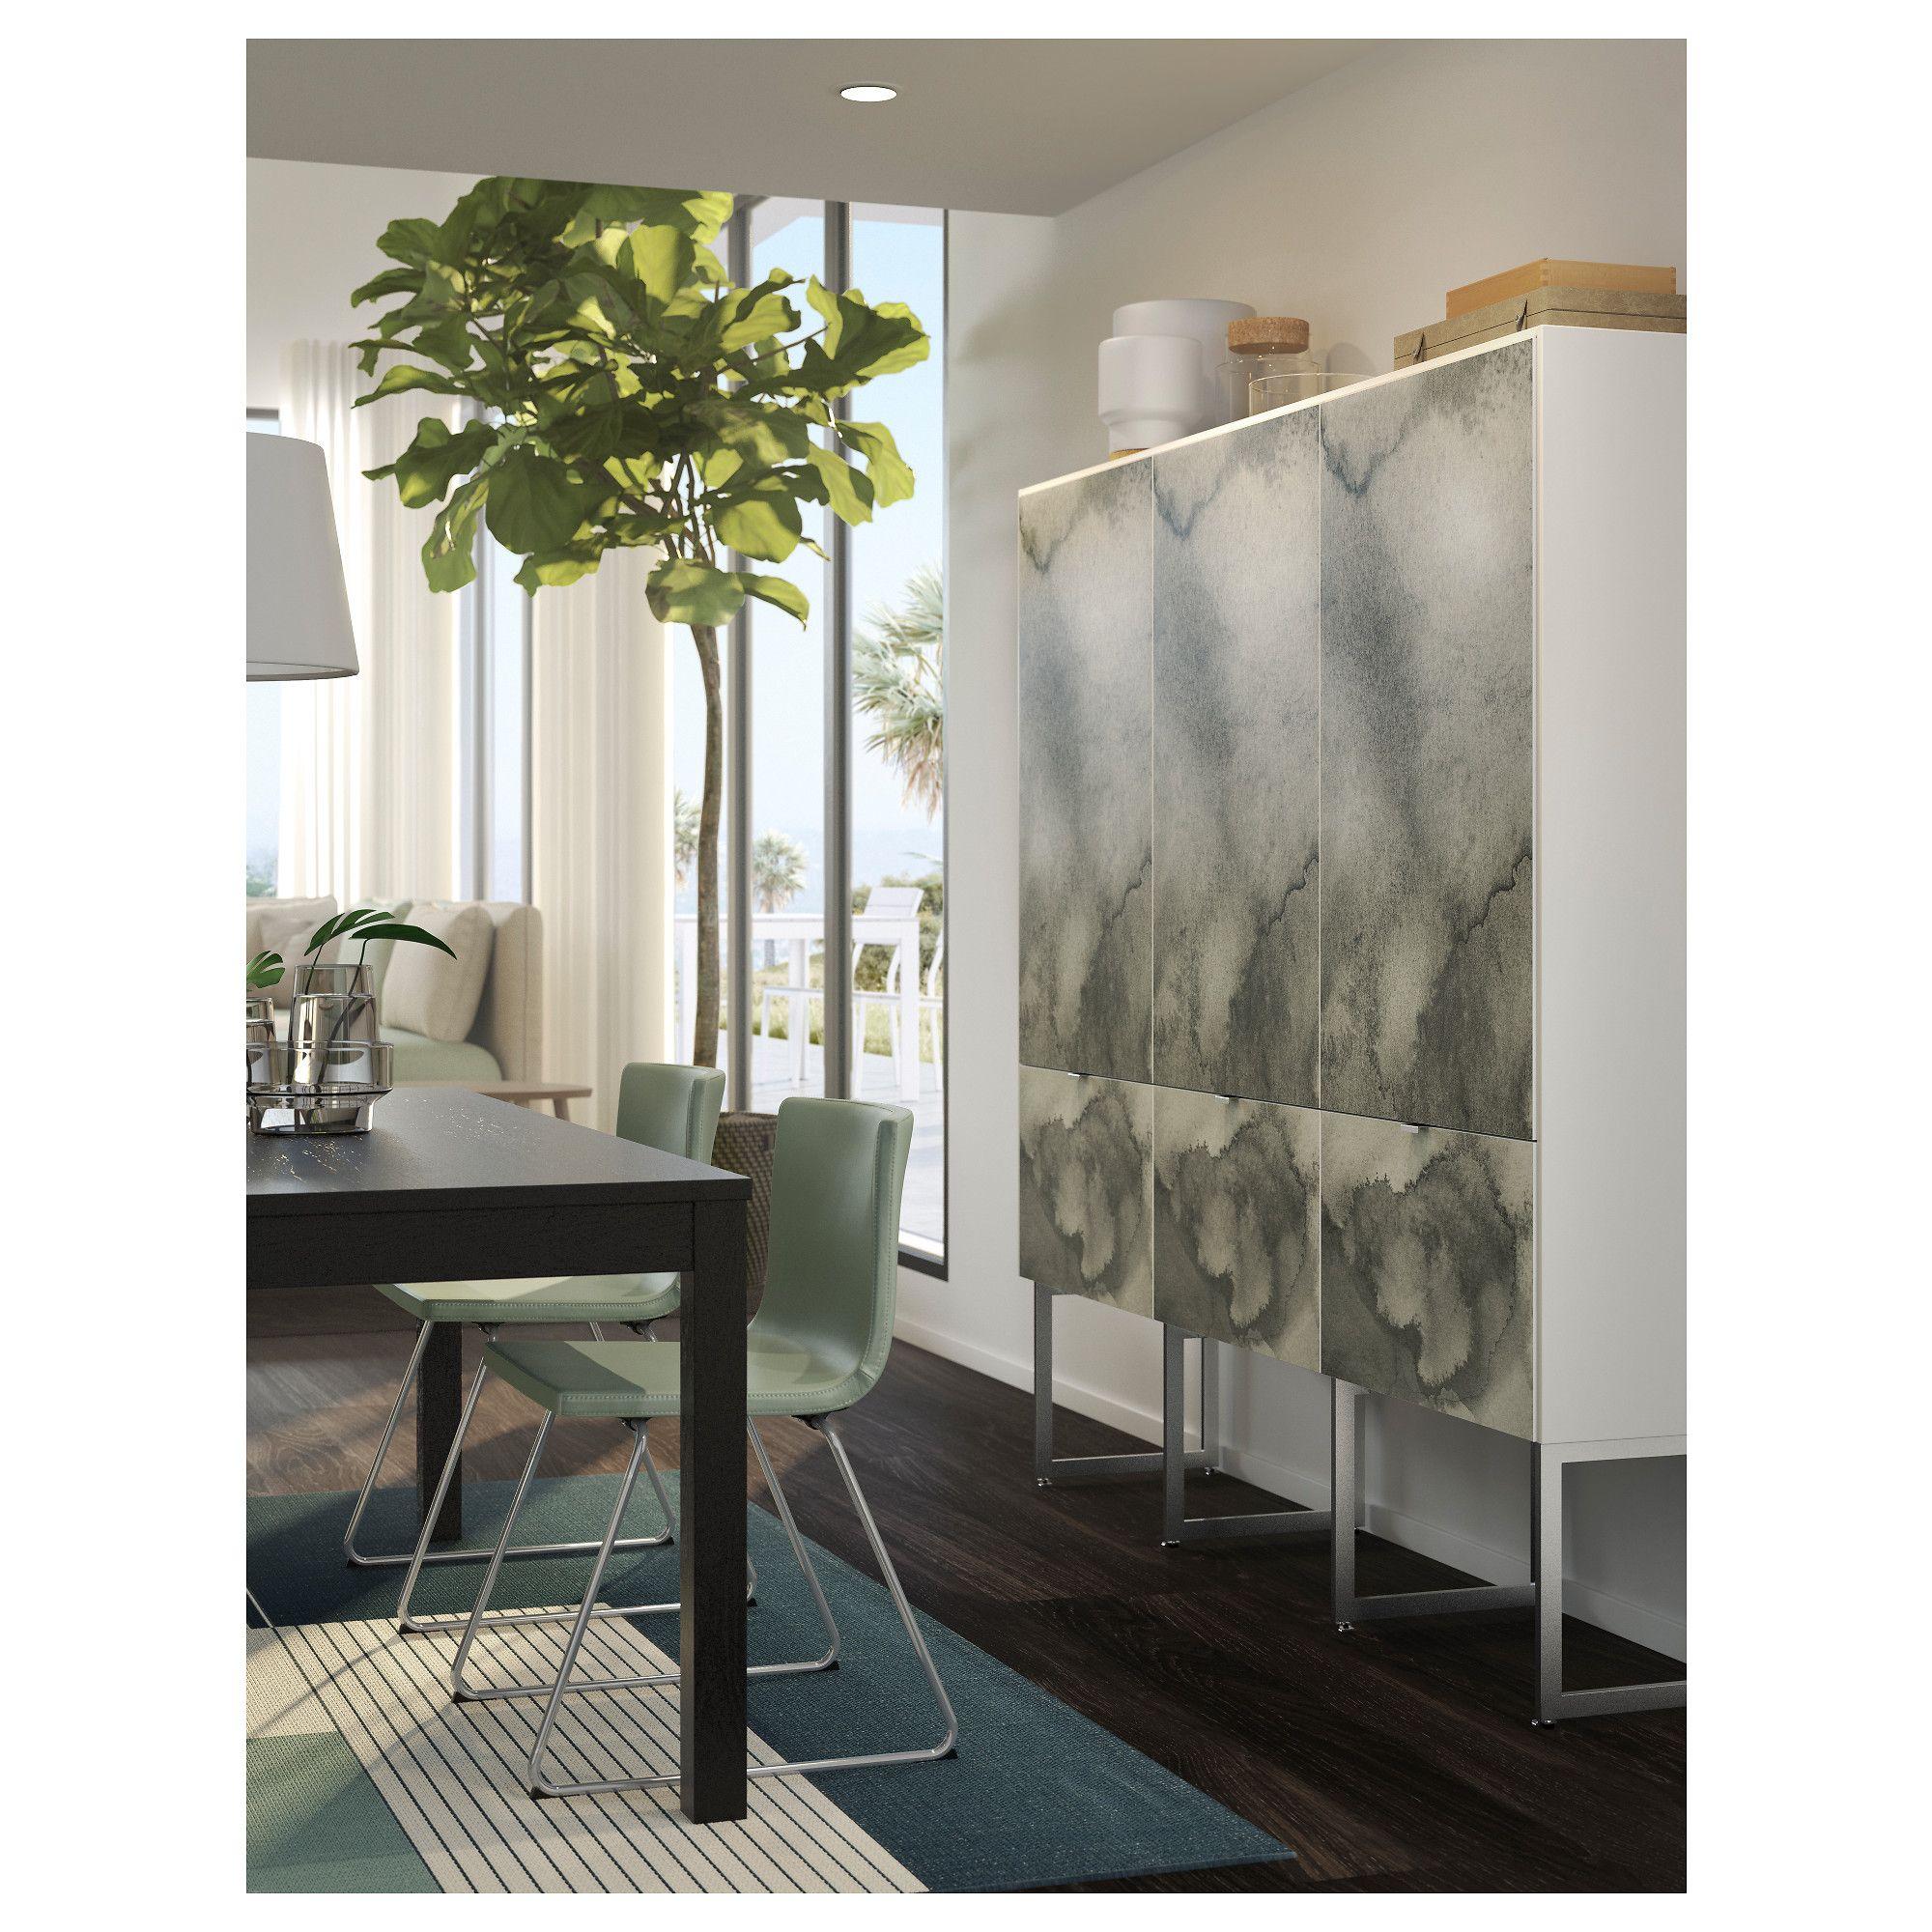 7efd4ec6023d828557e2a2524b3805b9 Frais De Bar De Salon Ikea Concept